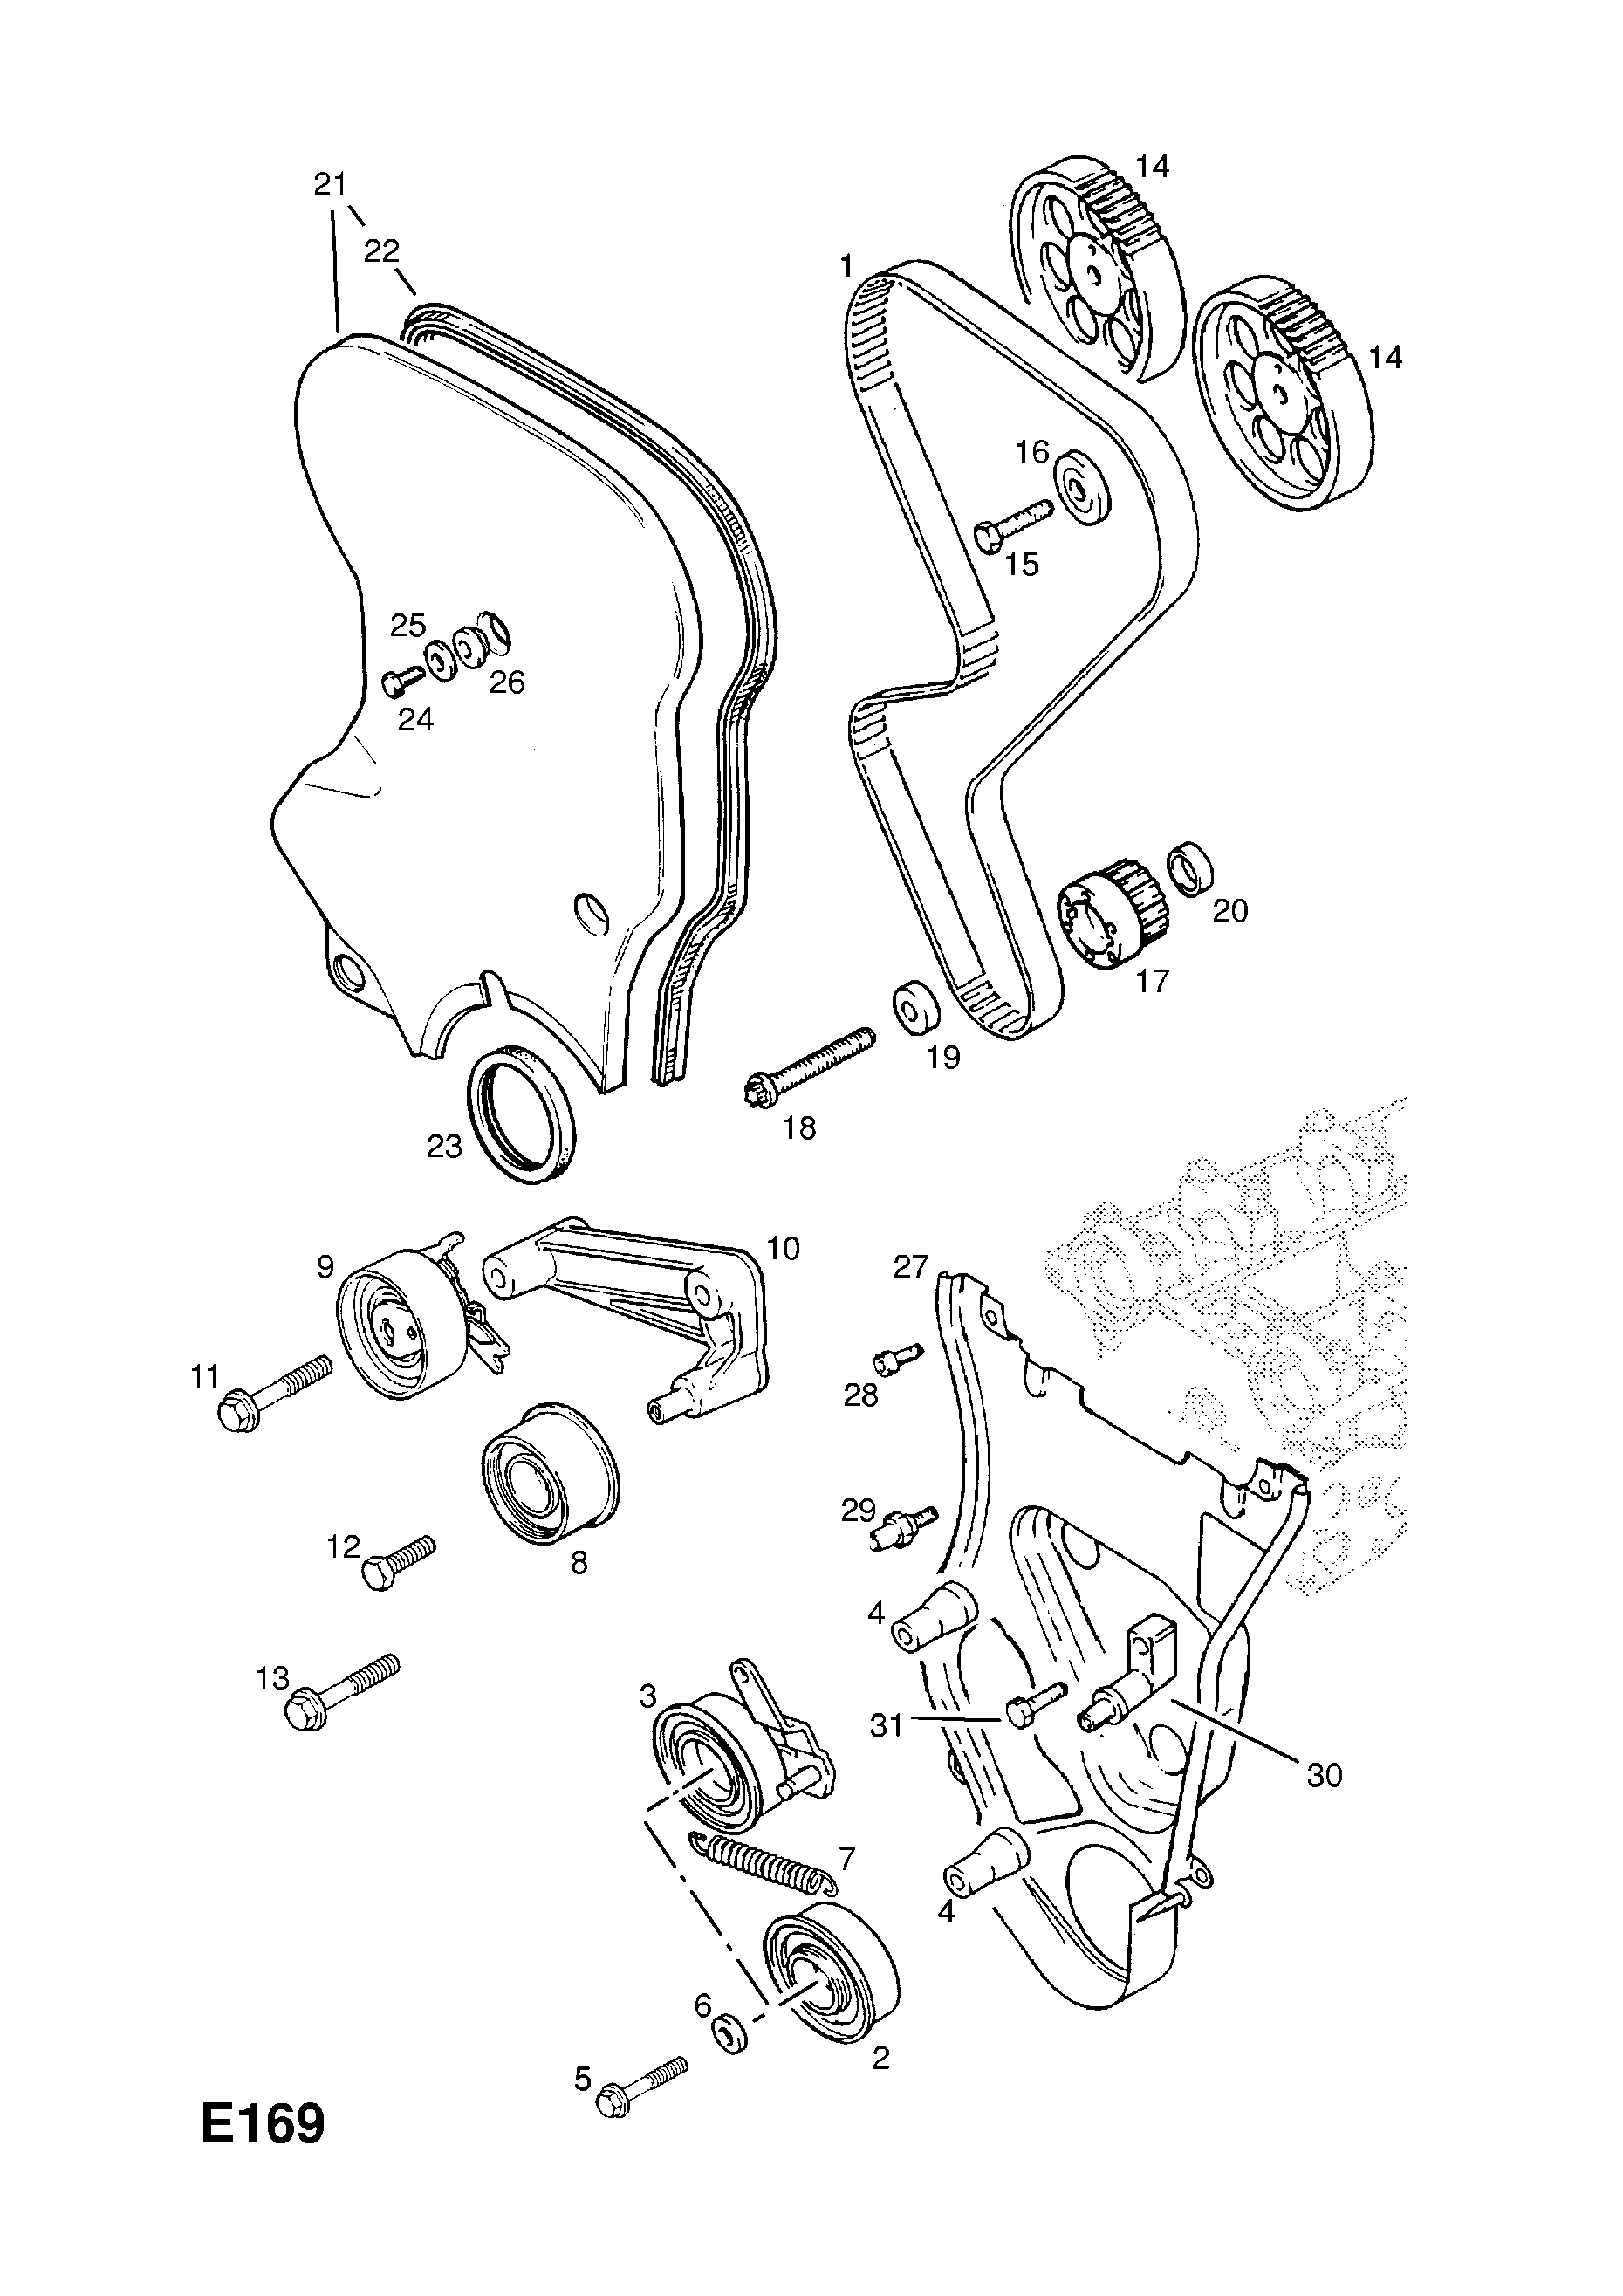 Vauxhall Astra F 1992 1998 E Engine And Clutch 13 C20xelj1 Opel Timing Belt Gm Part Number Genuine Description Range